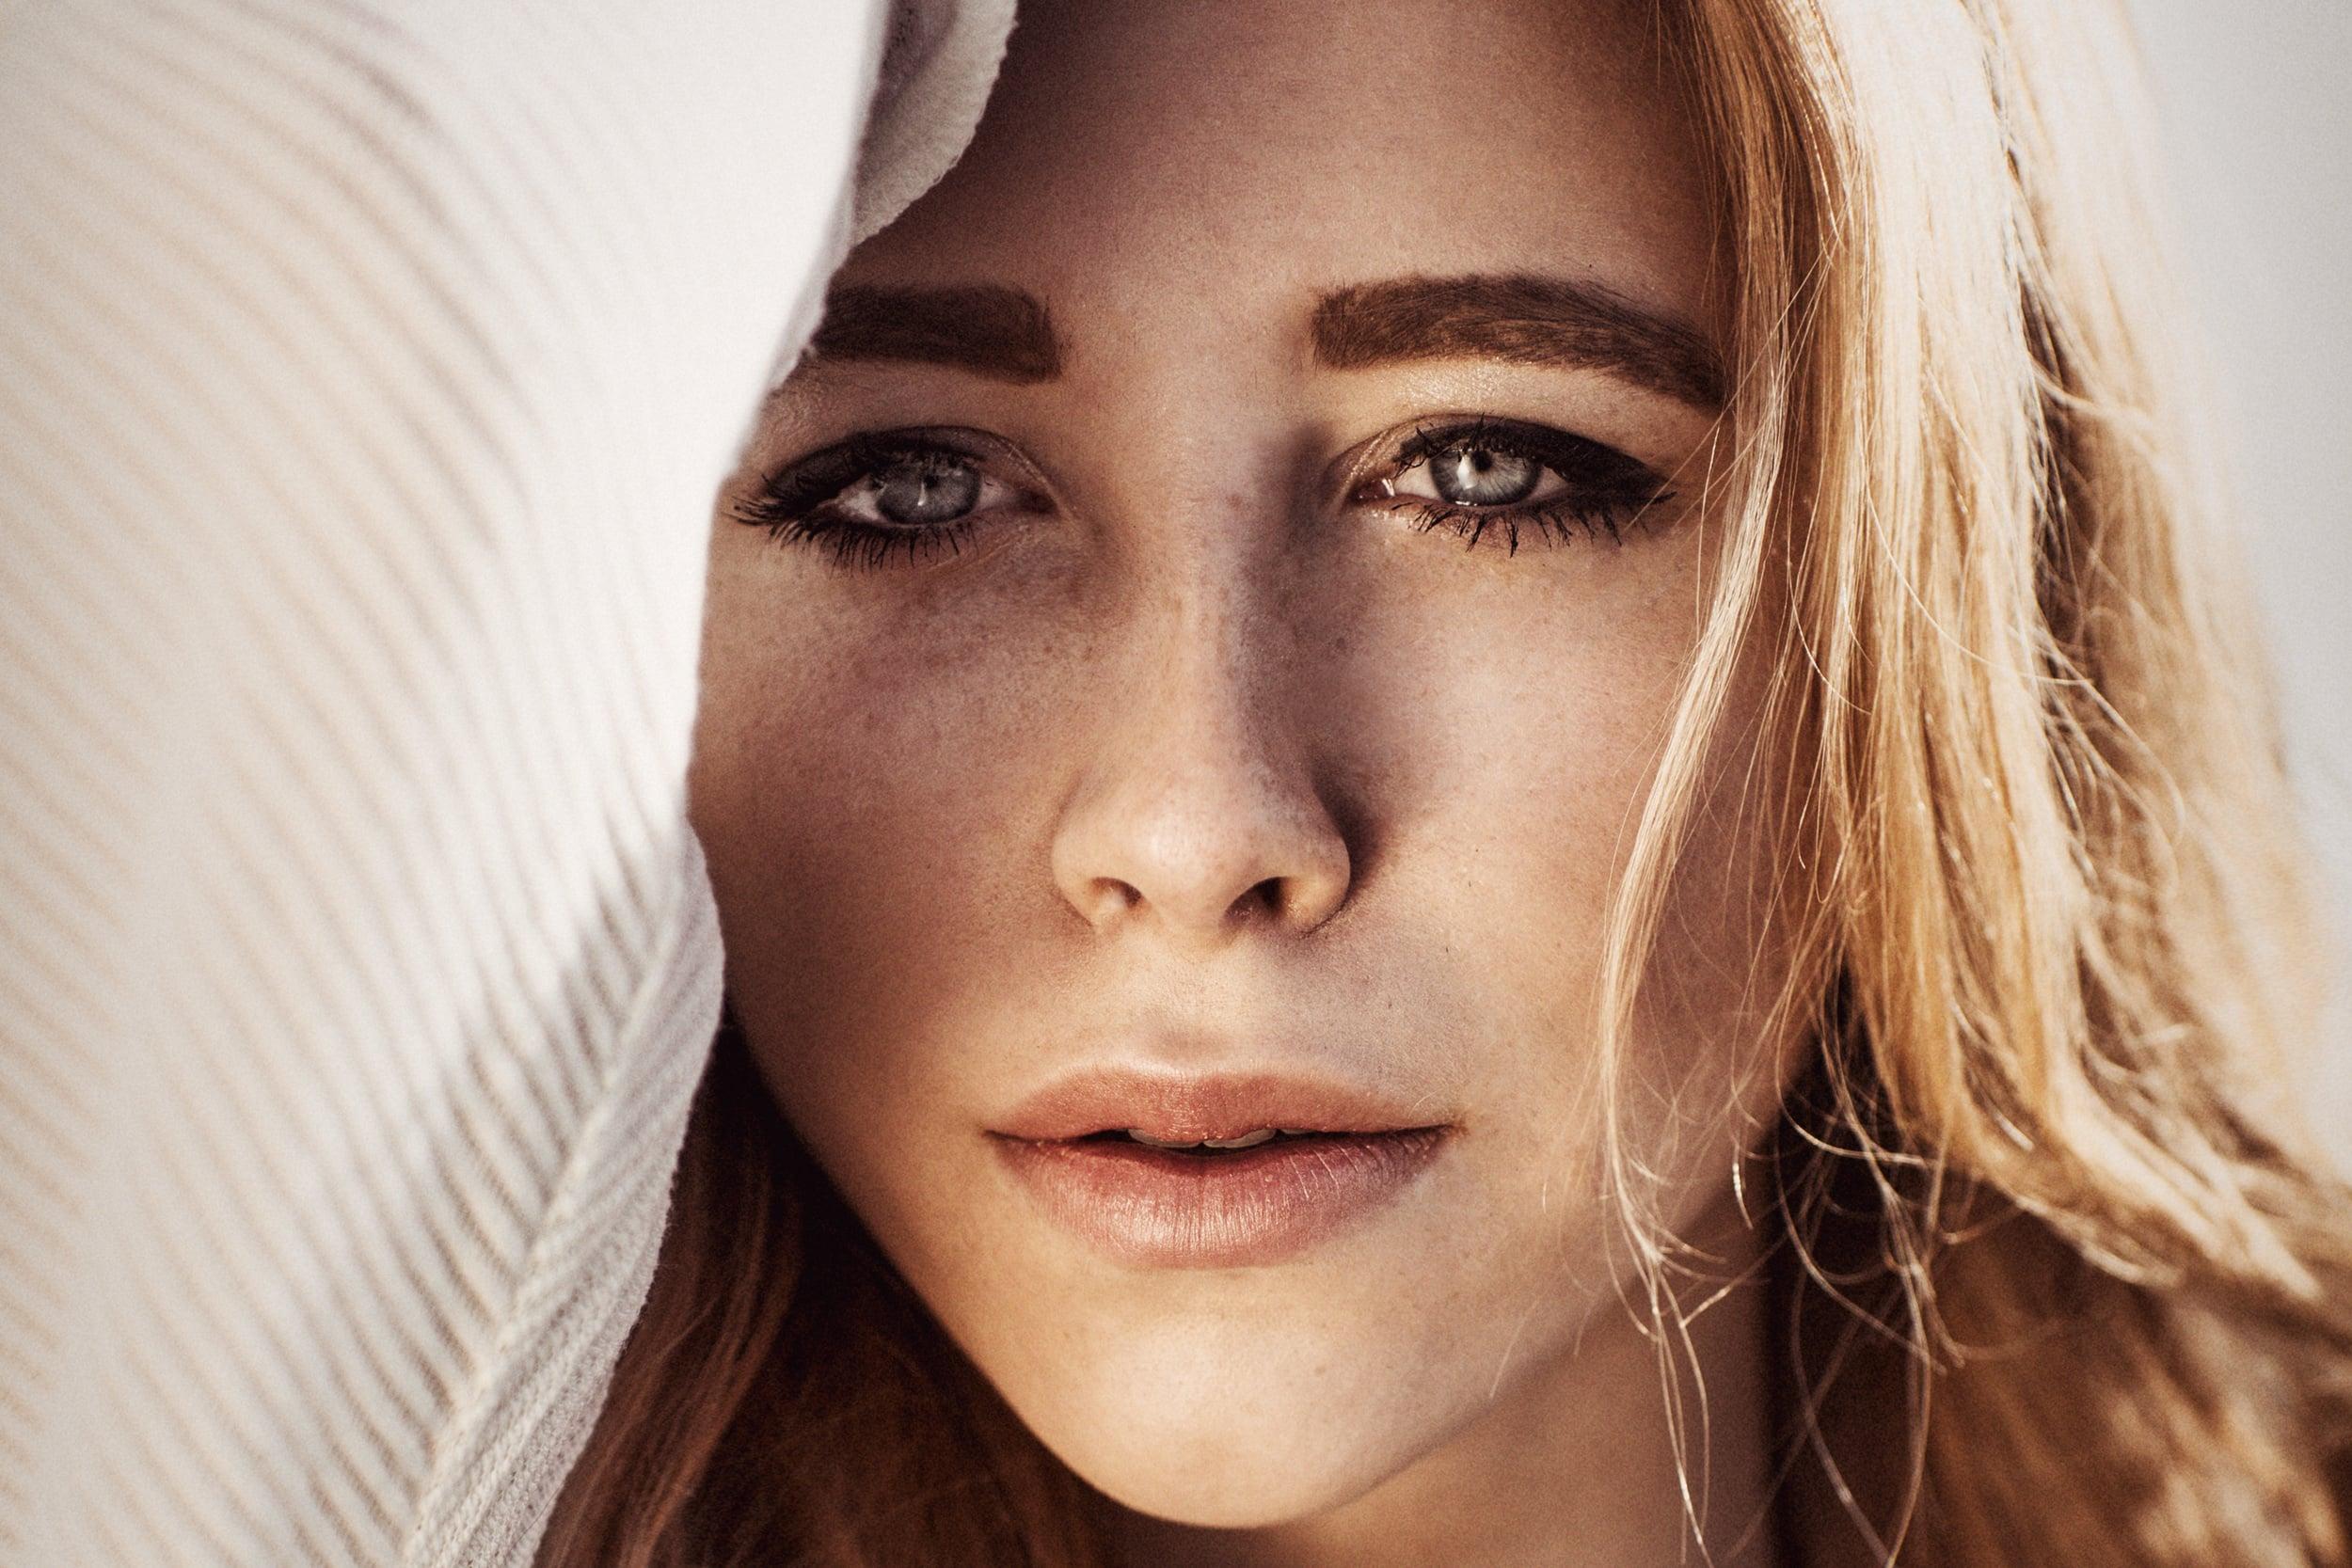 Portraits Models und Fashion  Fotograf Lukas Lehmann aus